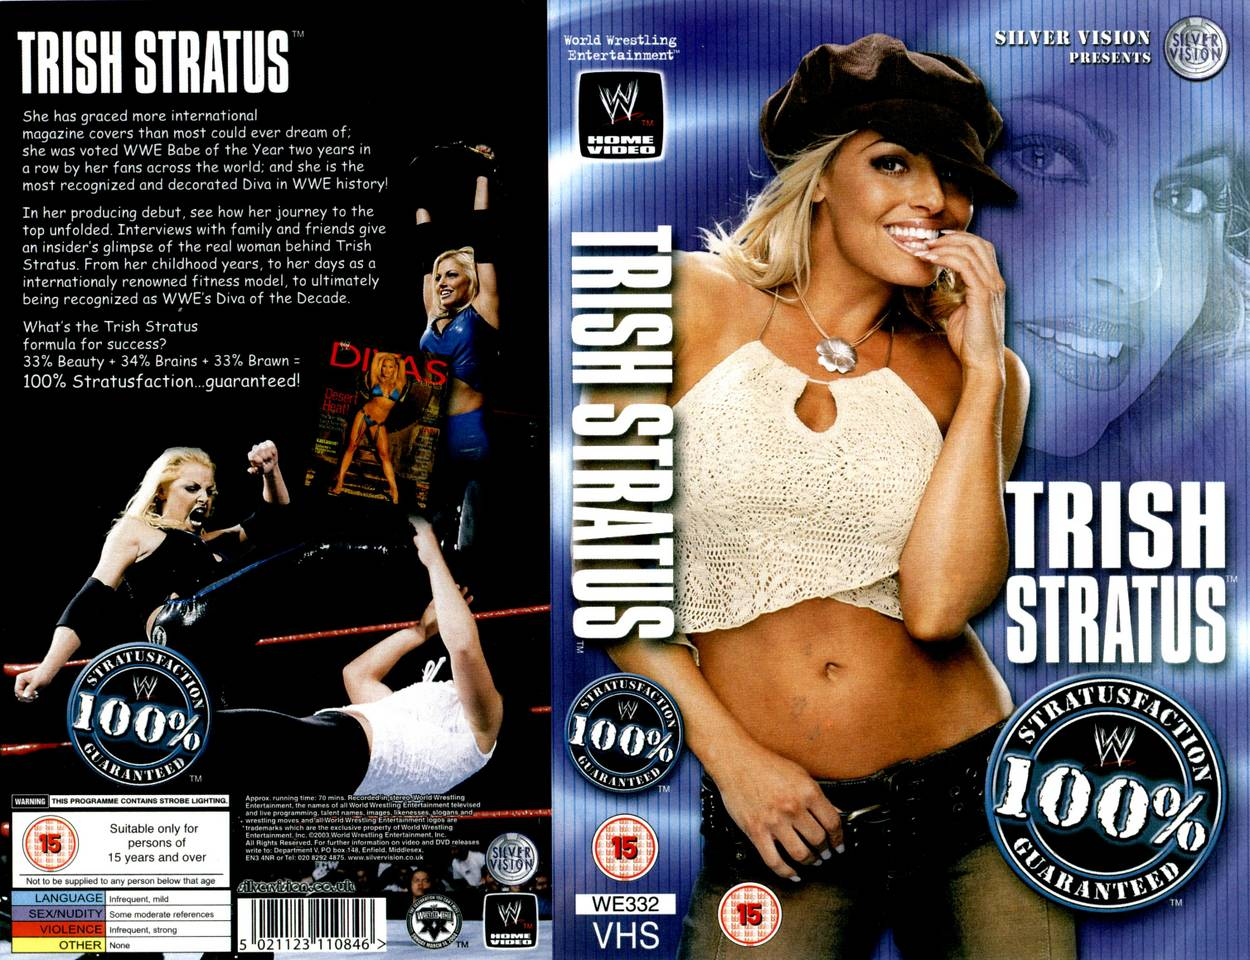 trishstratus1008oo